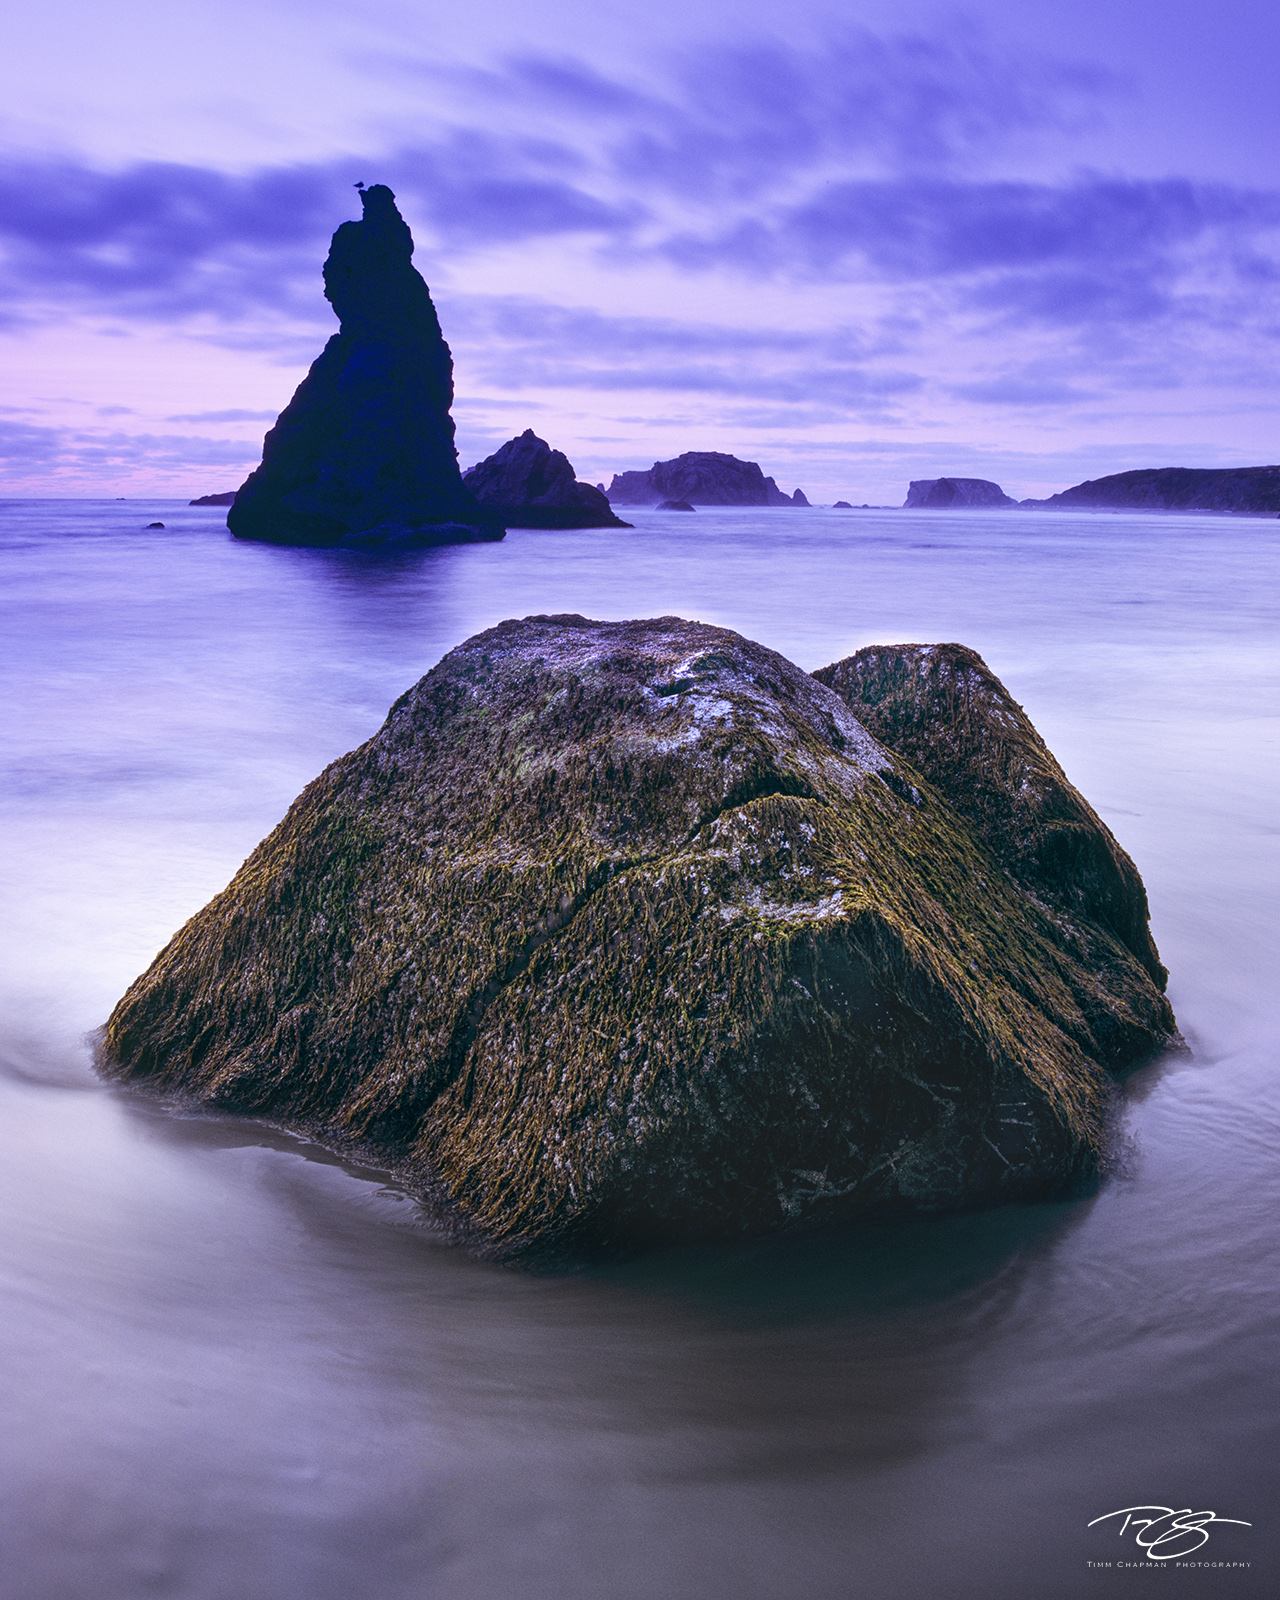 High Tide swirls about a seaweed laden rock beneath lavender skies